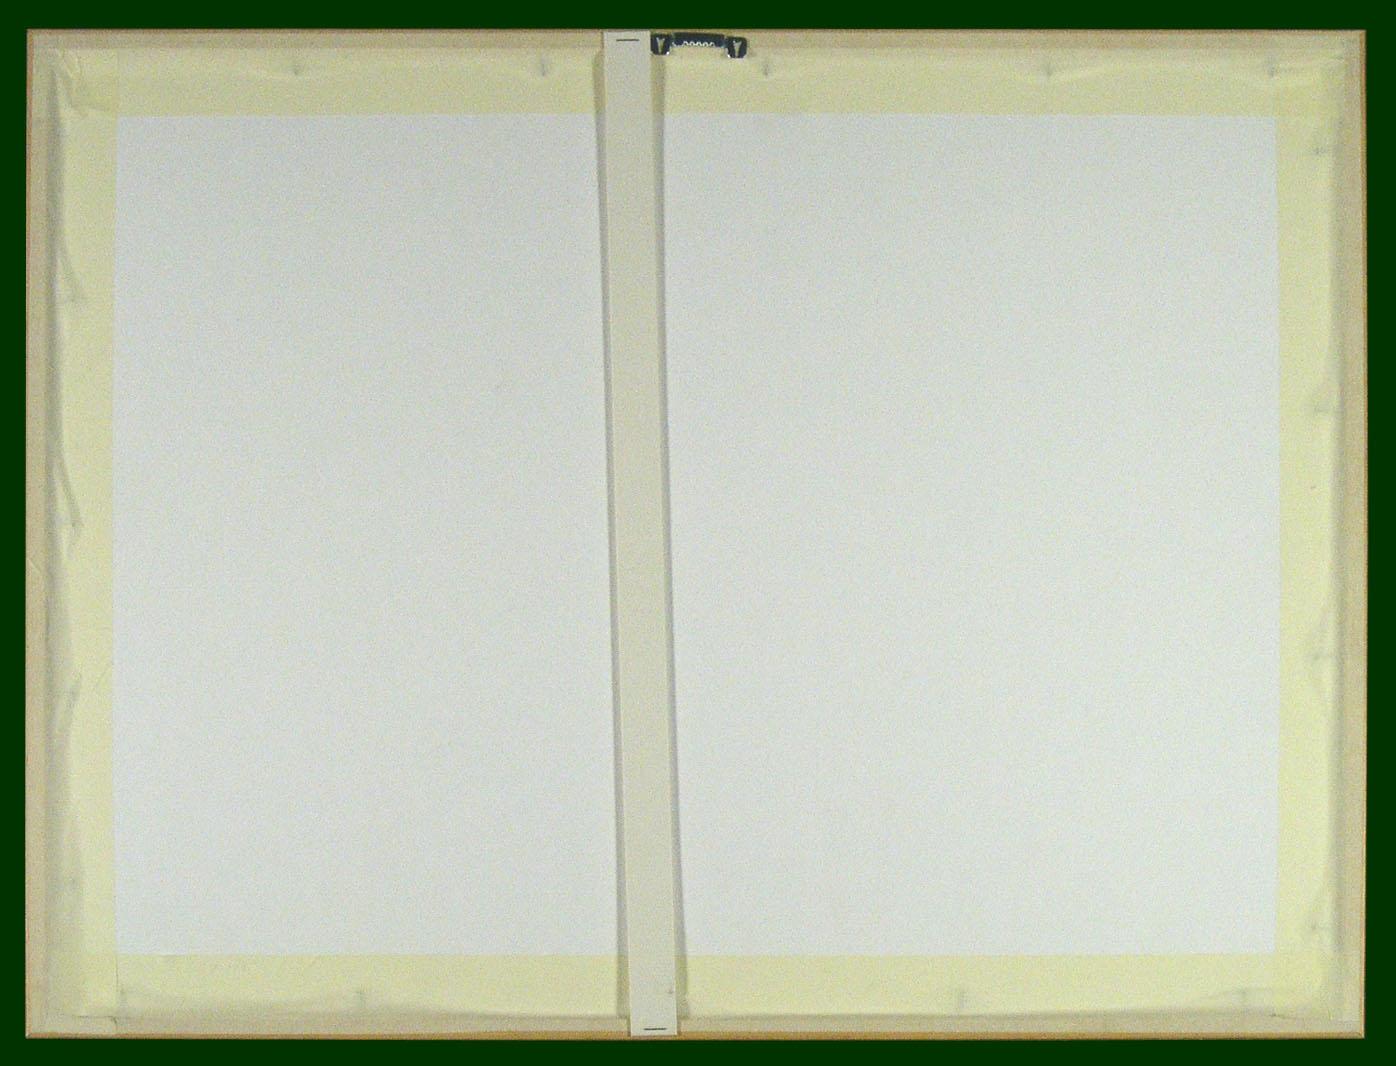 55-10hat.JPG (1396×1066)